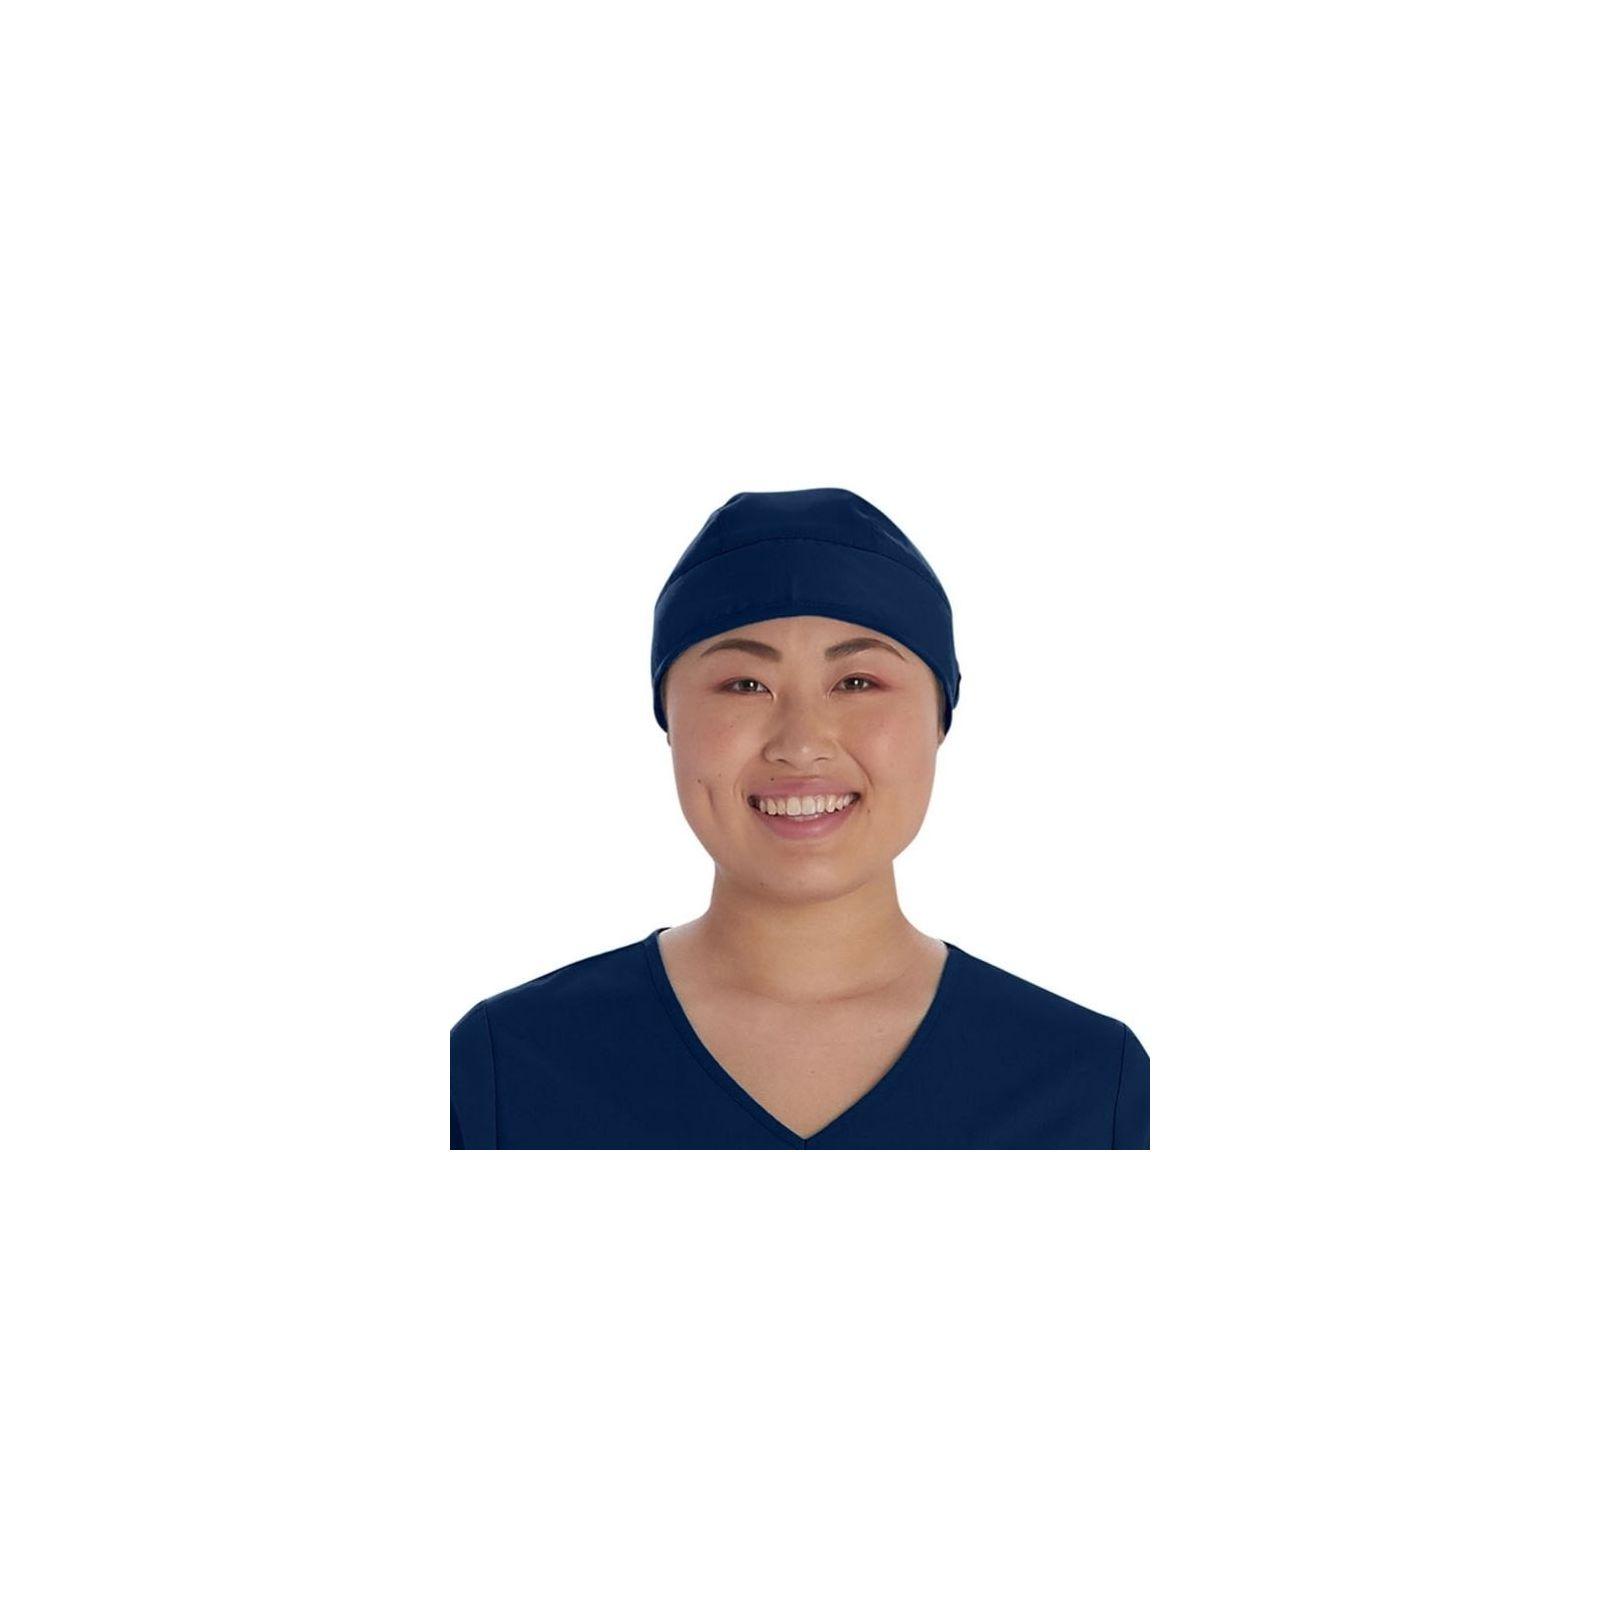 Calot médical Bleu marine (VT520NAV) vue face